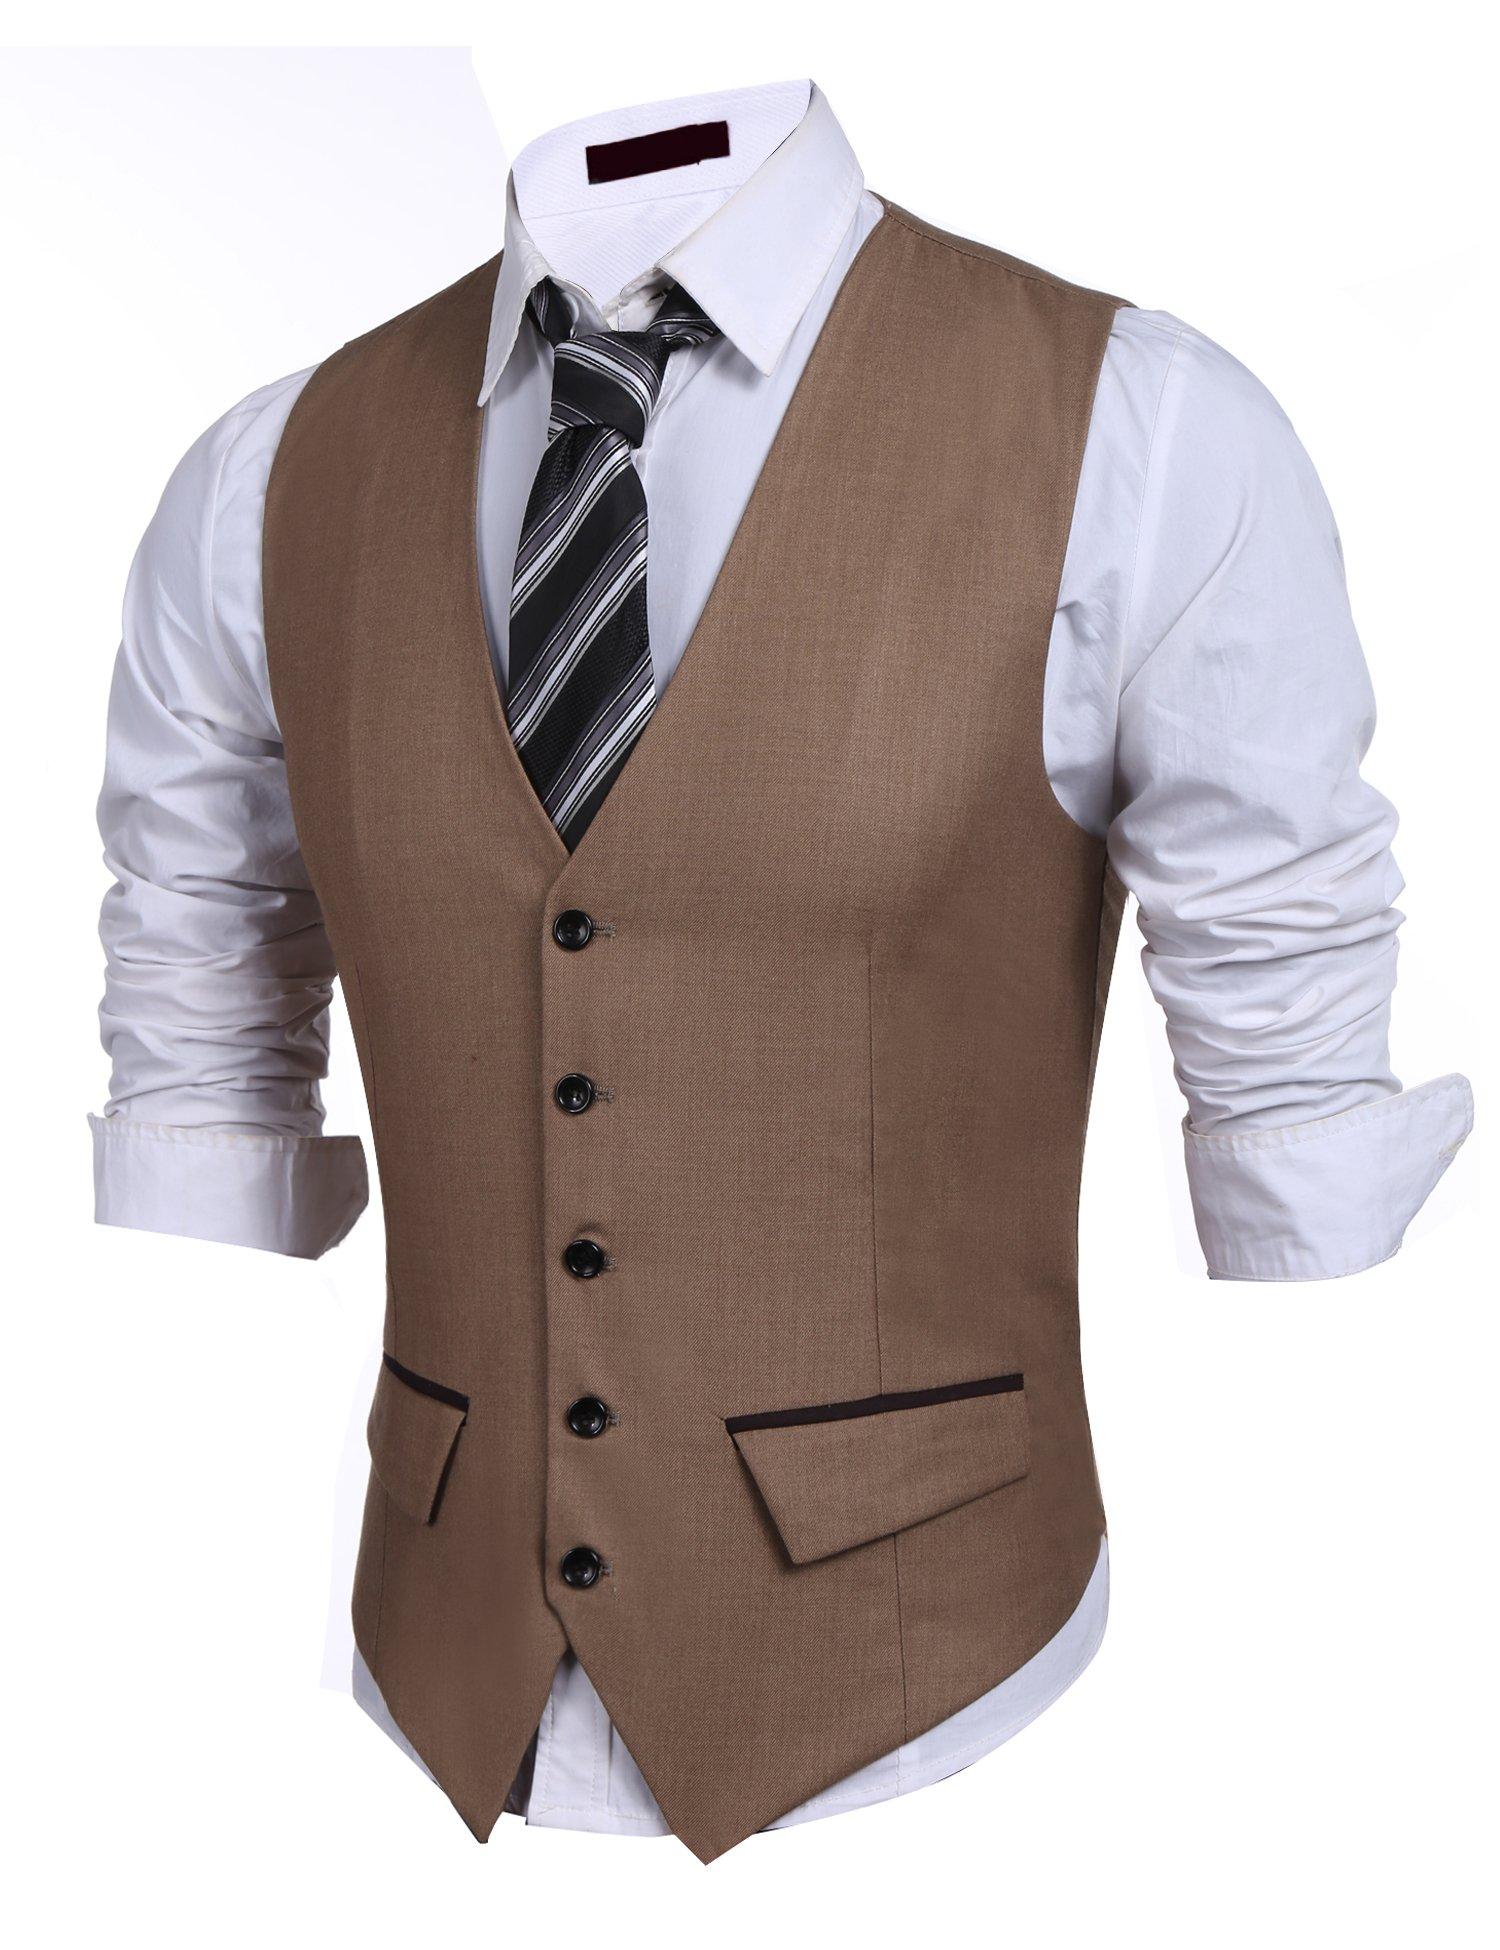 PEATAO Men's Suit Vest, Designed Casual Slim Fit Dress Vest Waistcoat